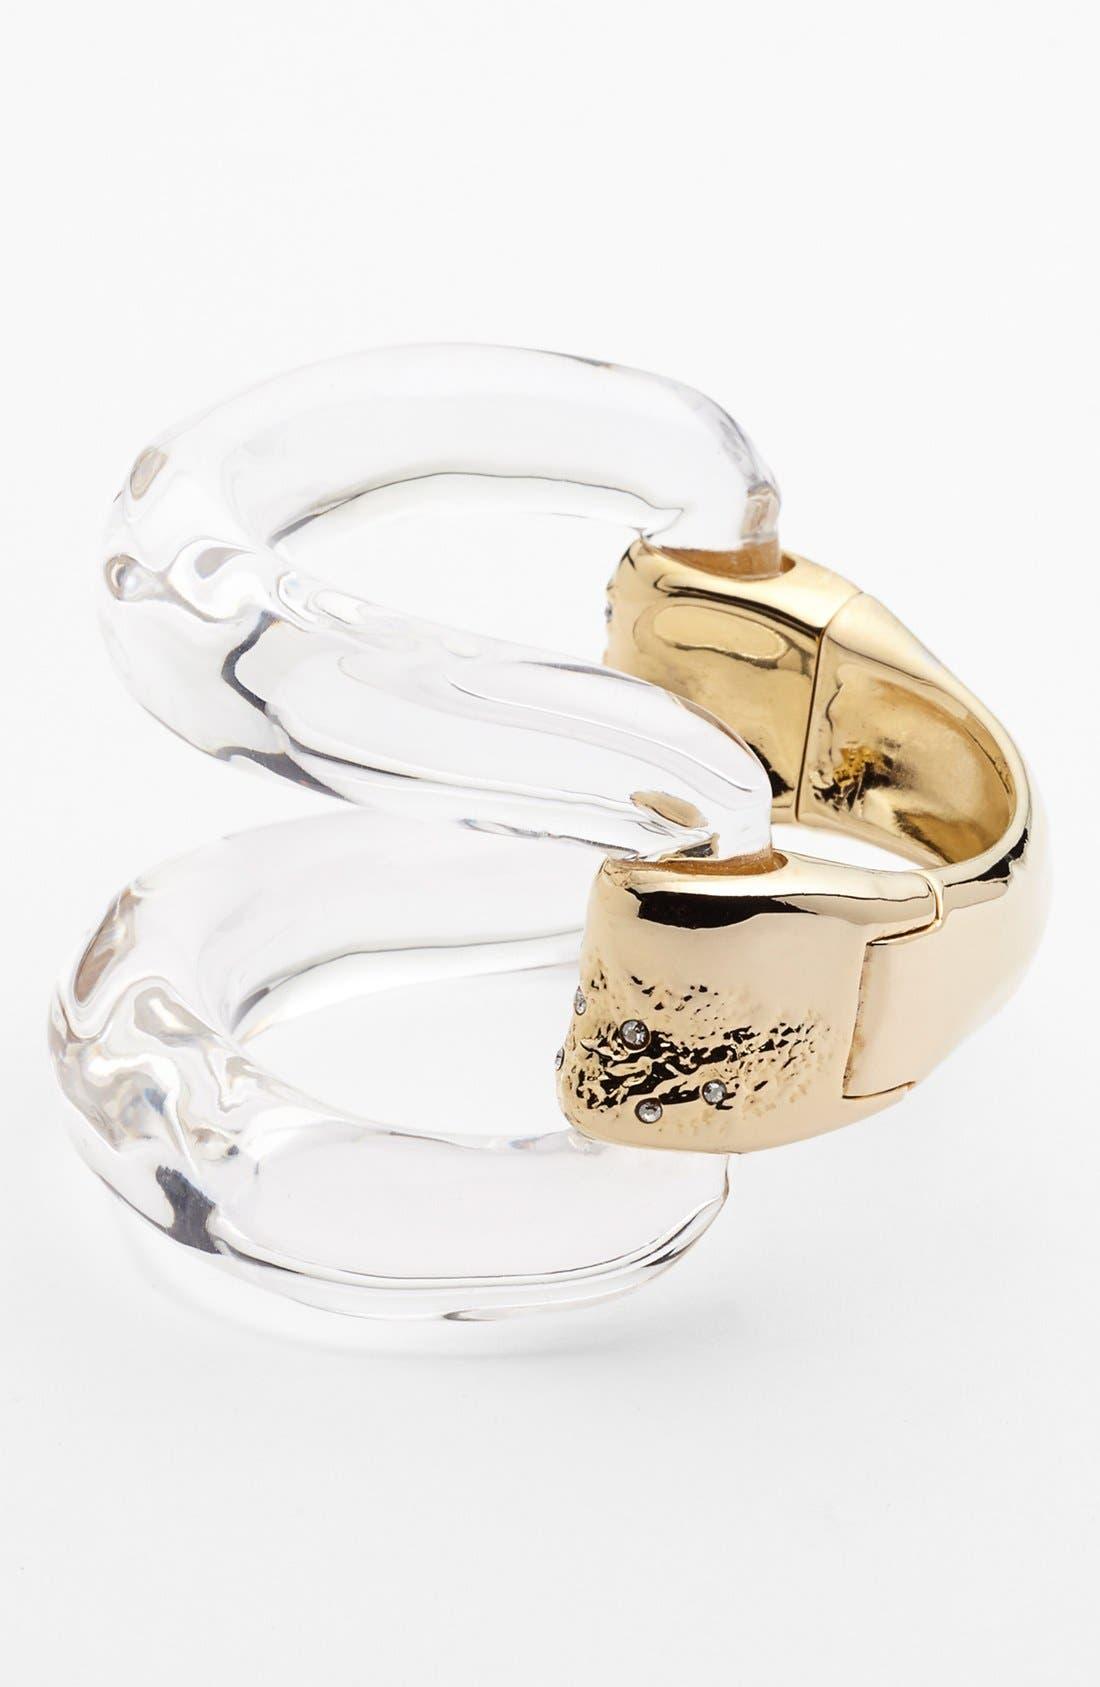 Main Image - Alexis Bittar 'Lucite®' Open Statement Bracelet